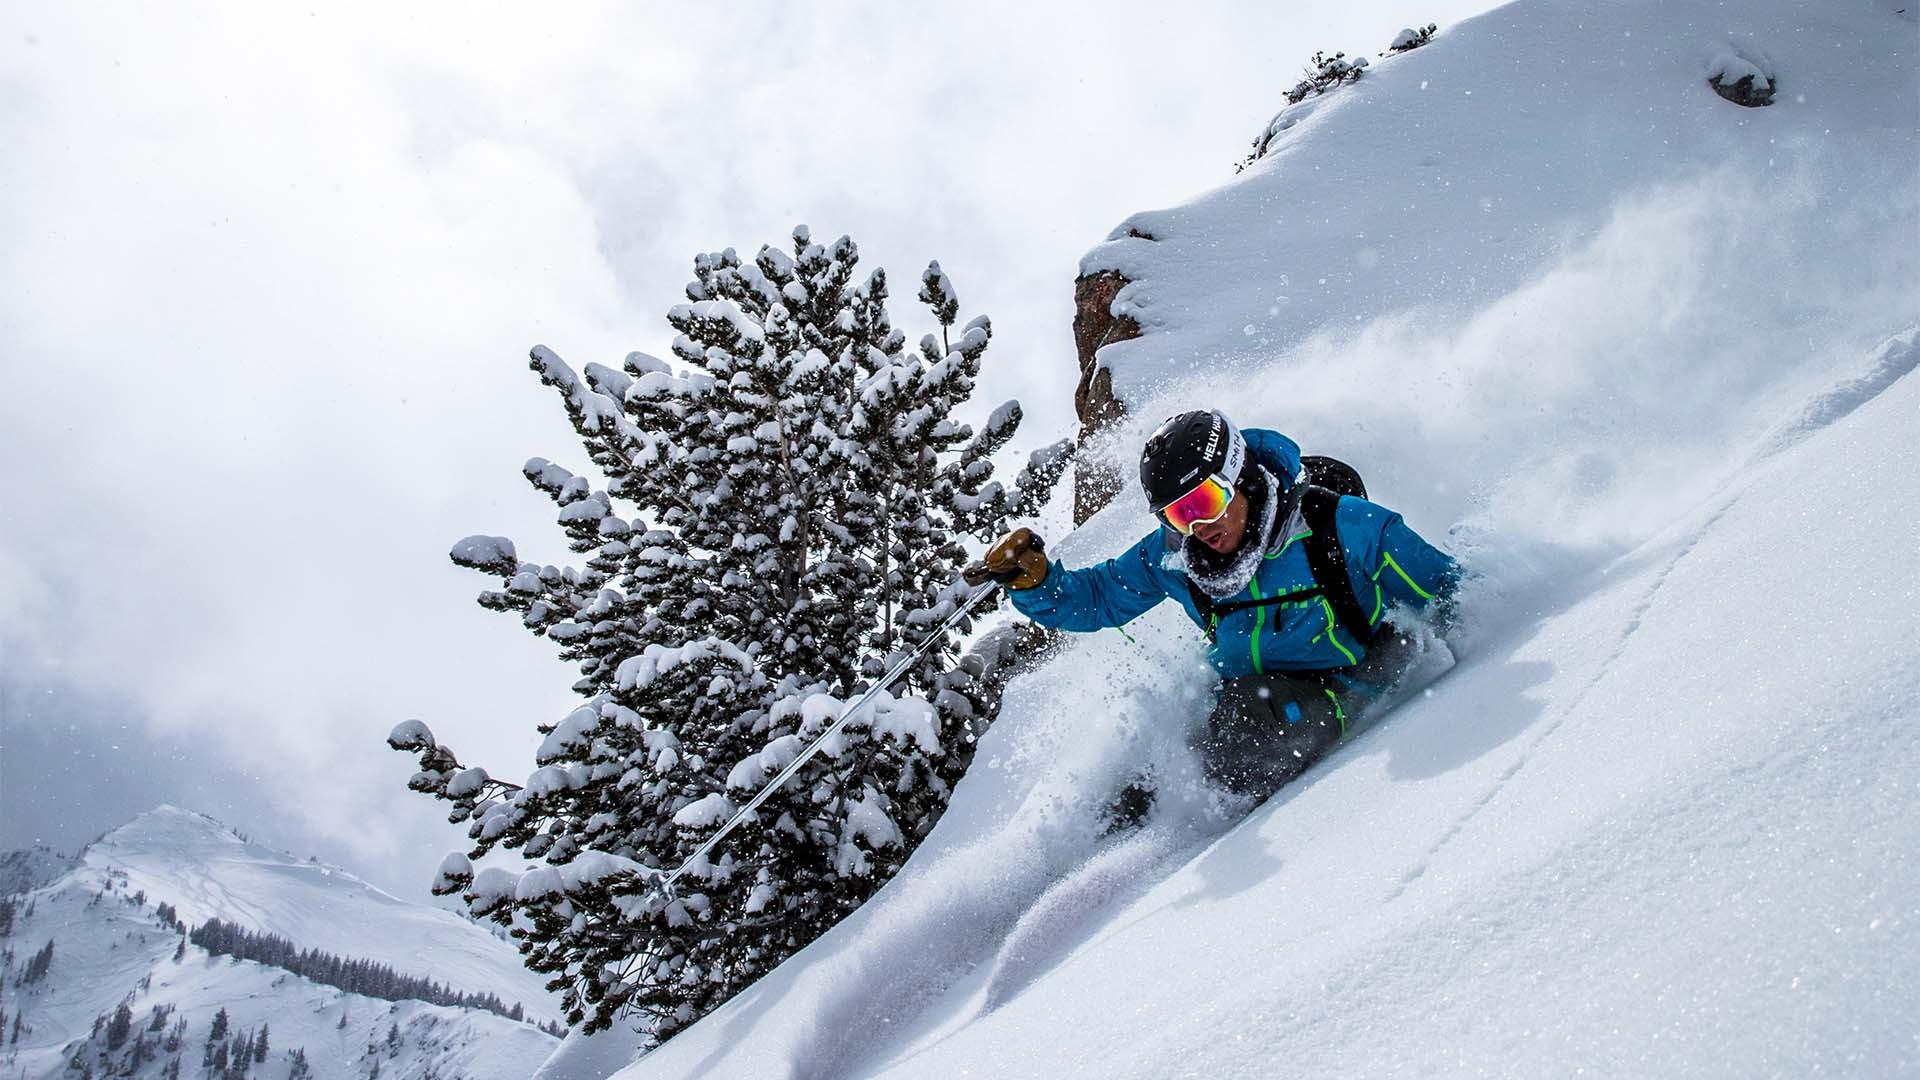 Skiing at Solitude Mountain Resort, Utah, USA